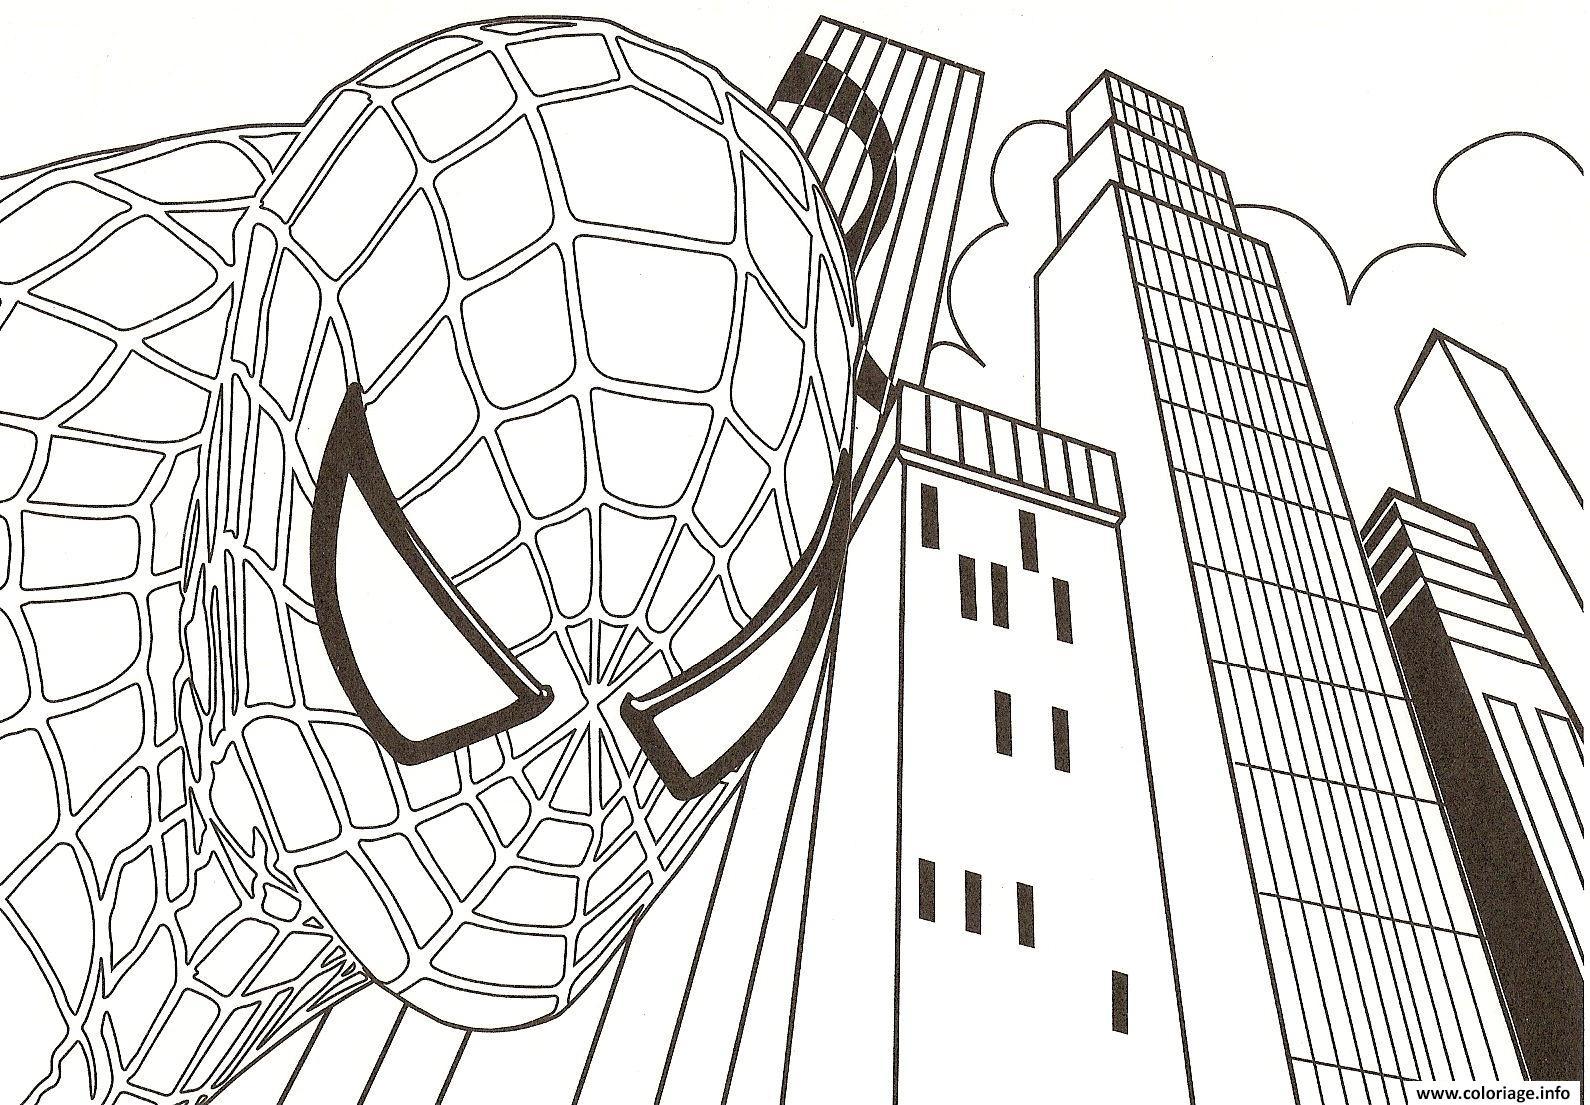 Coloriage spiderman dans la ville dessin - Coloriage en ligne spiderman ...